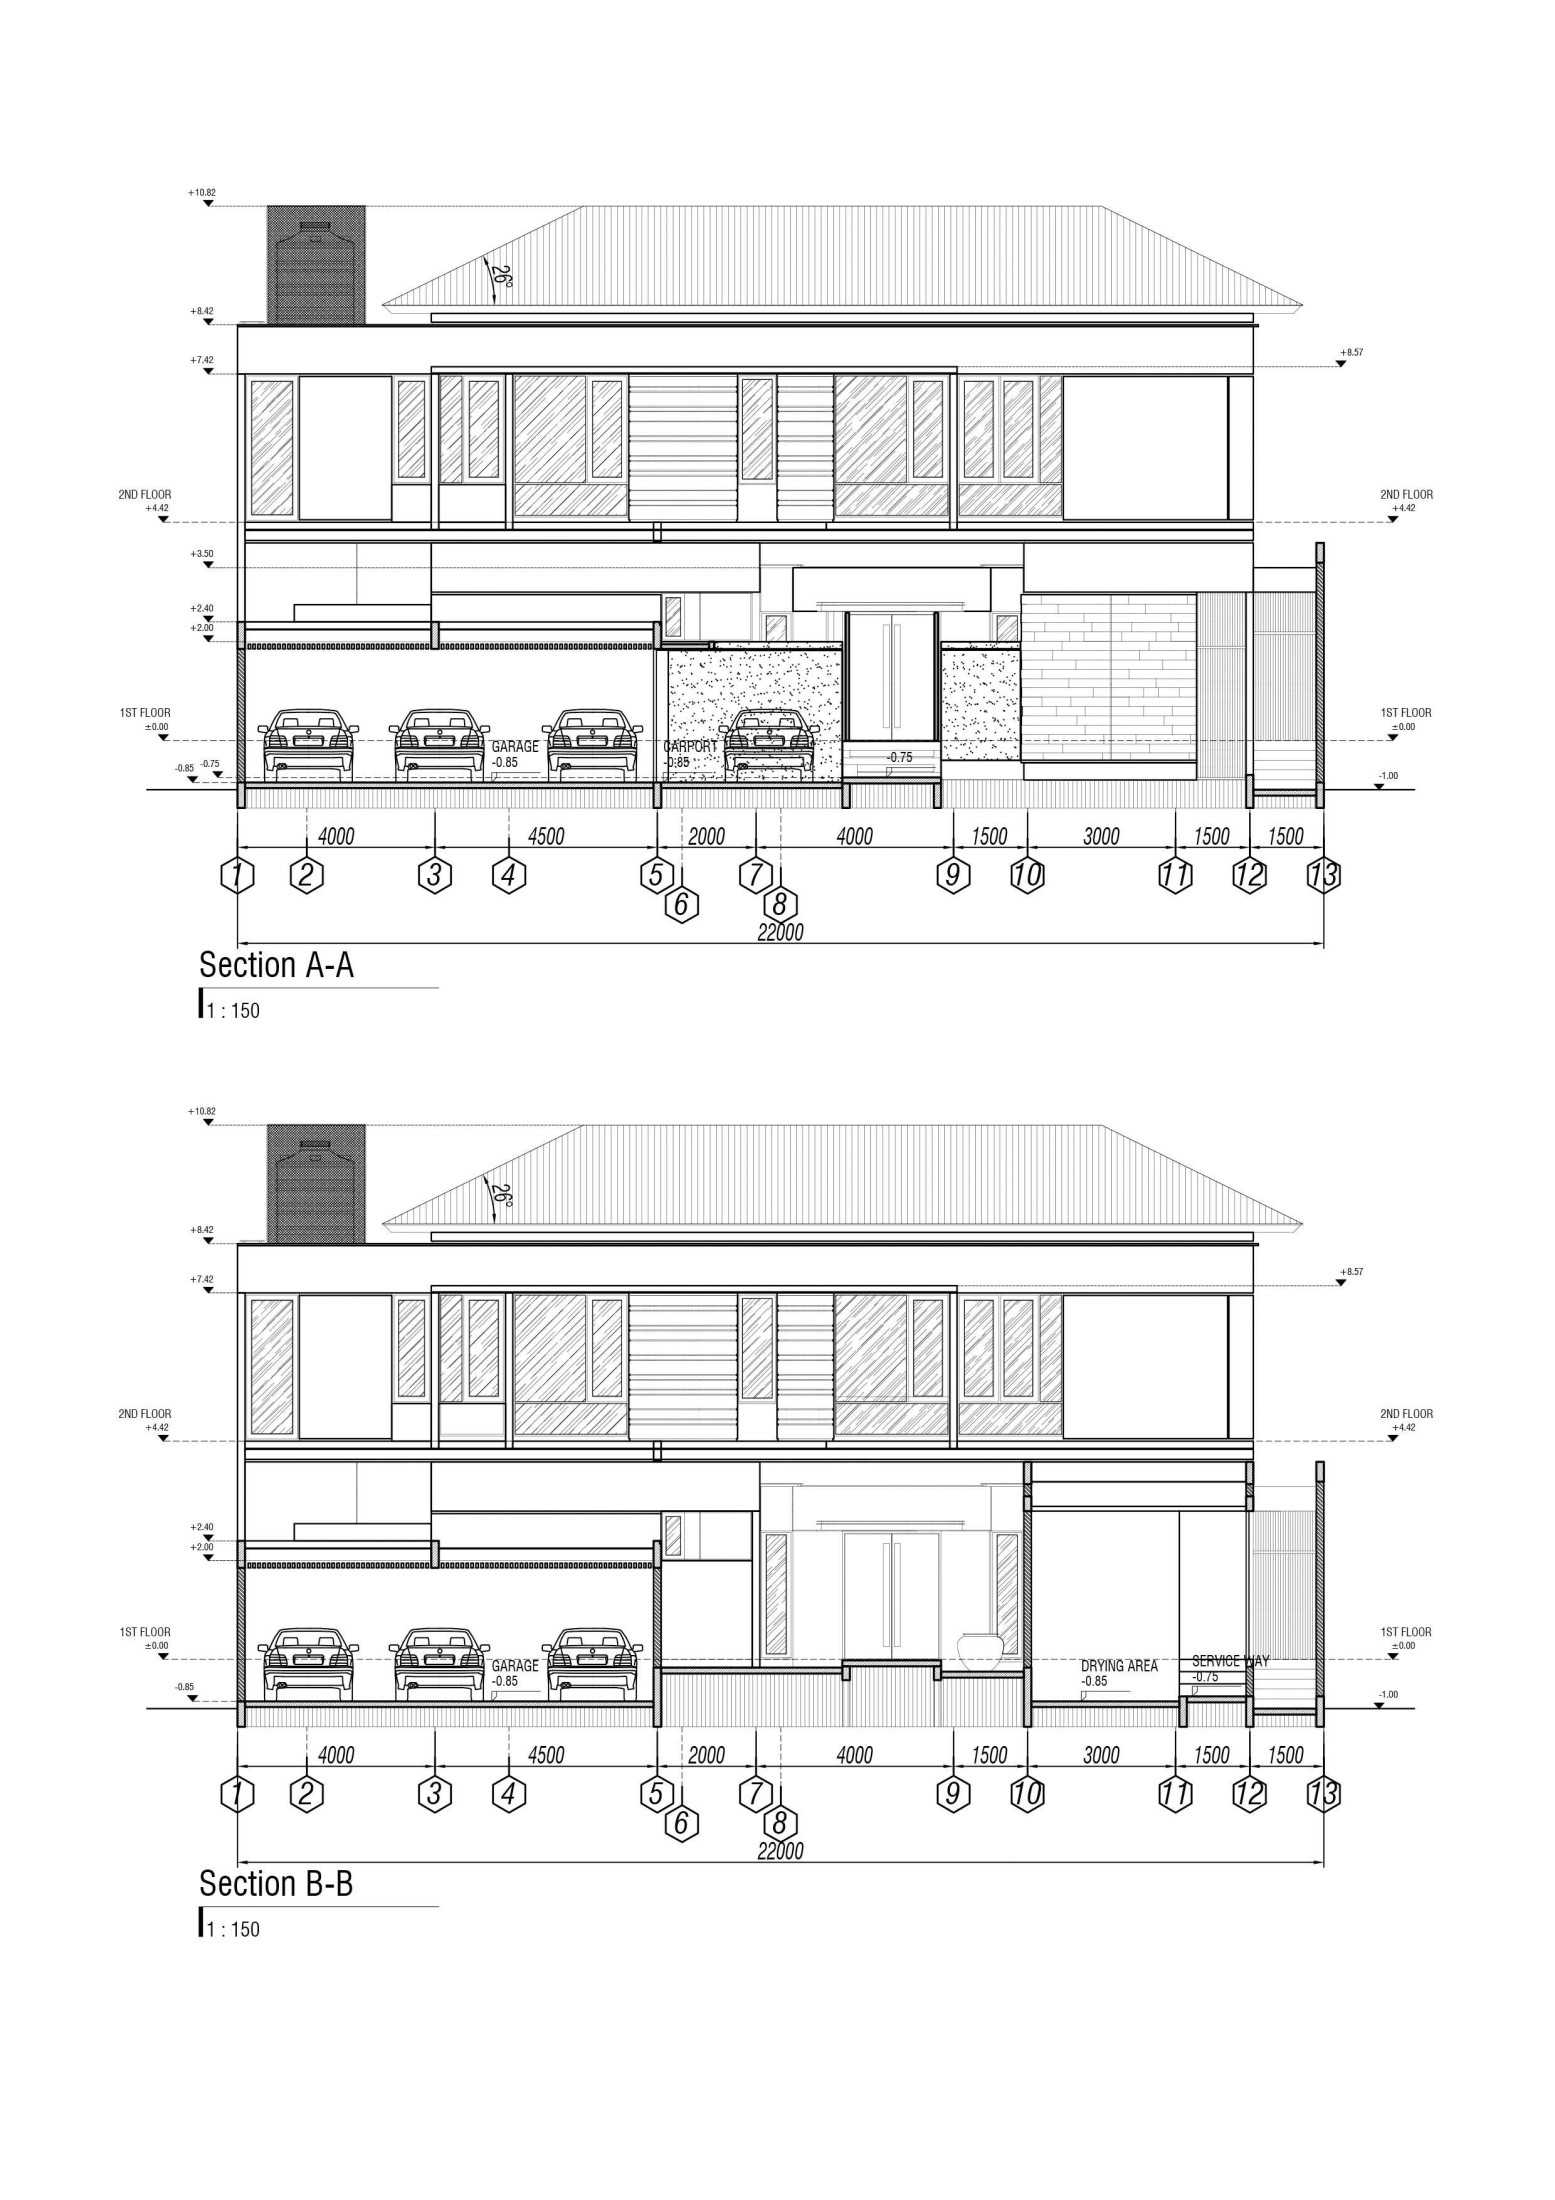 Y0 Design Architect S House Kec. Srono, Kabupaten Banyuwangi, Jawa Timur, Indonesia Kec. Srono, Kabupaten Banyuwangi, Jawa Timur, Indonesia Yohanes-Iswara-Limandjaya-S-House  121101